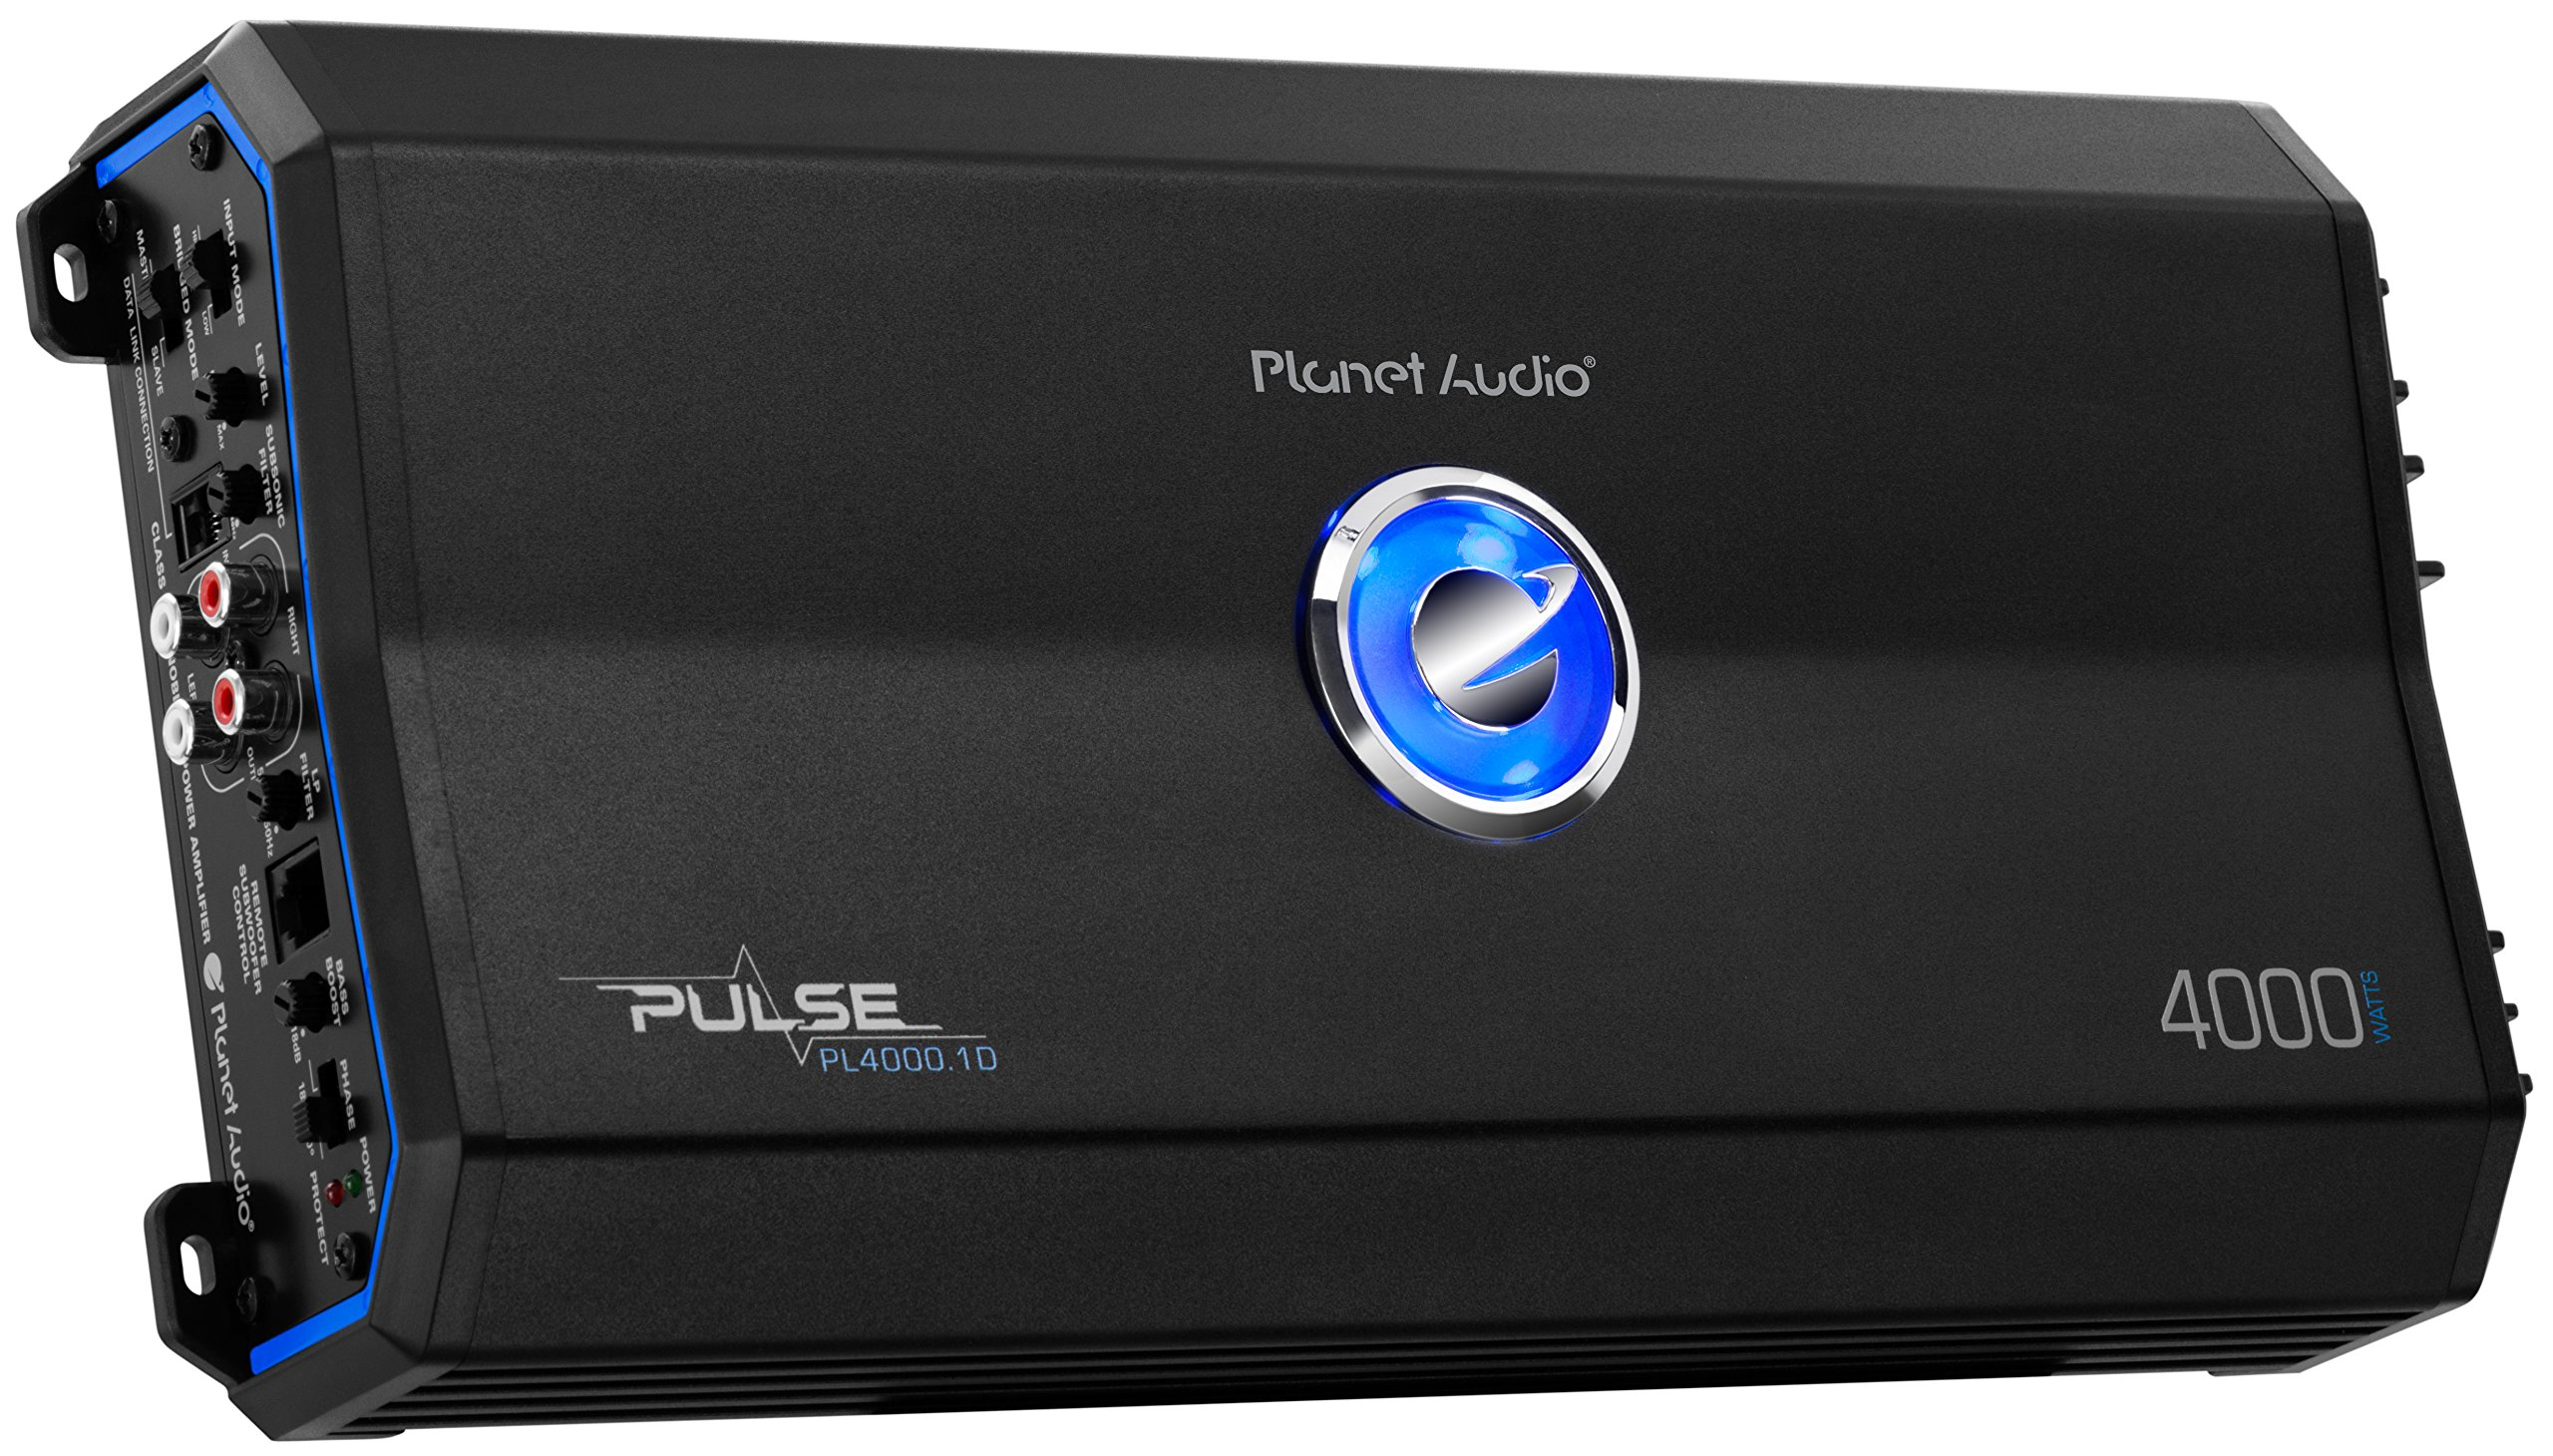 Planet Audio PL4000.1D Pulse 4000 Watt, 1 Ohm Stable Class D Monoblock Car Amplifier with Remote Subwoofer Control by Planet Audio (Image #2)